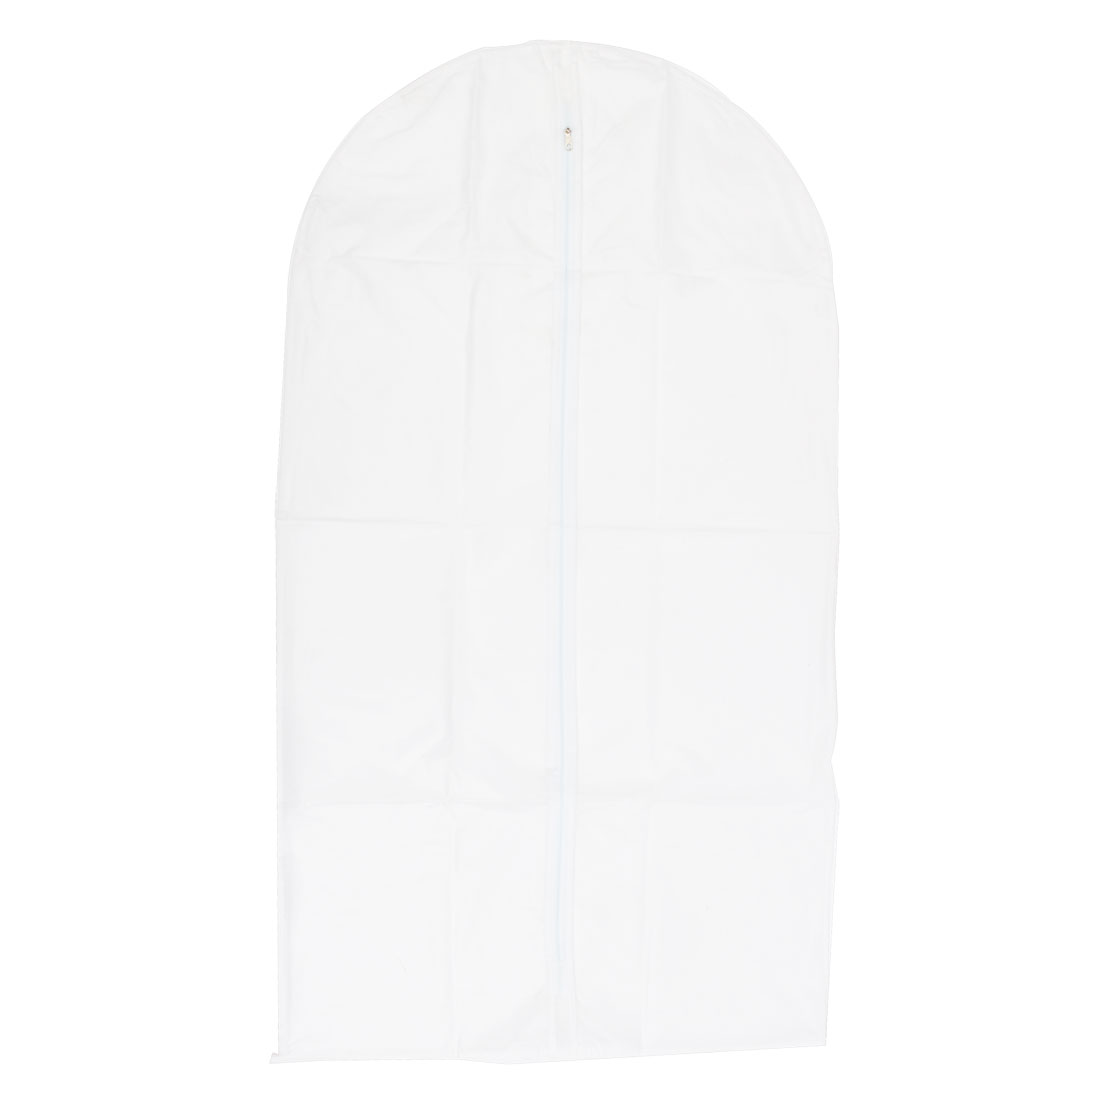 110cm x 60cm White Anti Dust Protective Suit Dress Garment Clothing Cover Bag - image 1 of 1